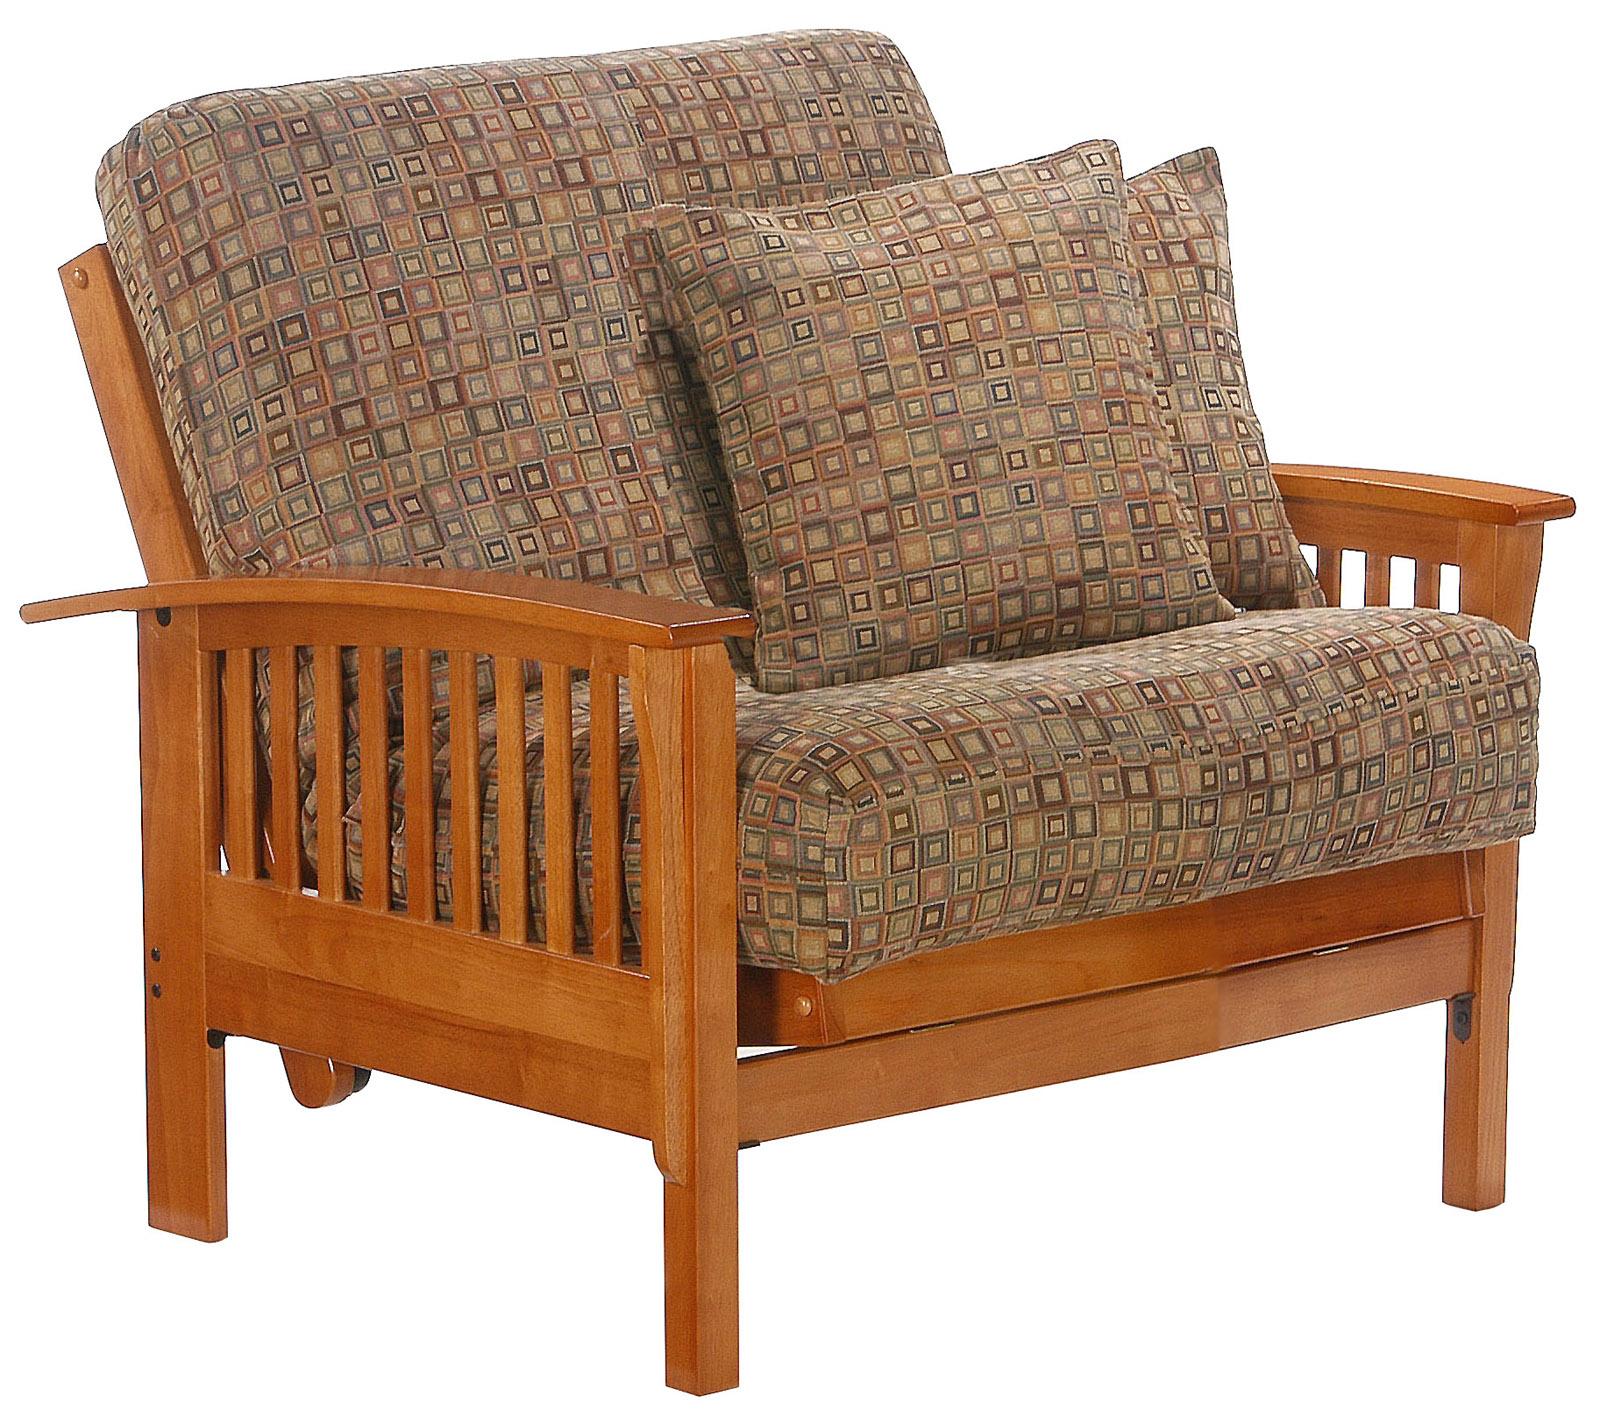 Furniture Gt Bedroom Furniture Gt Futon Cover Gt Solid